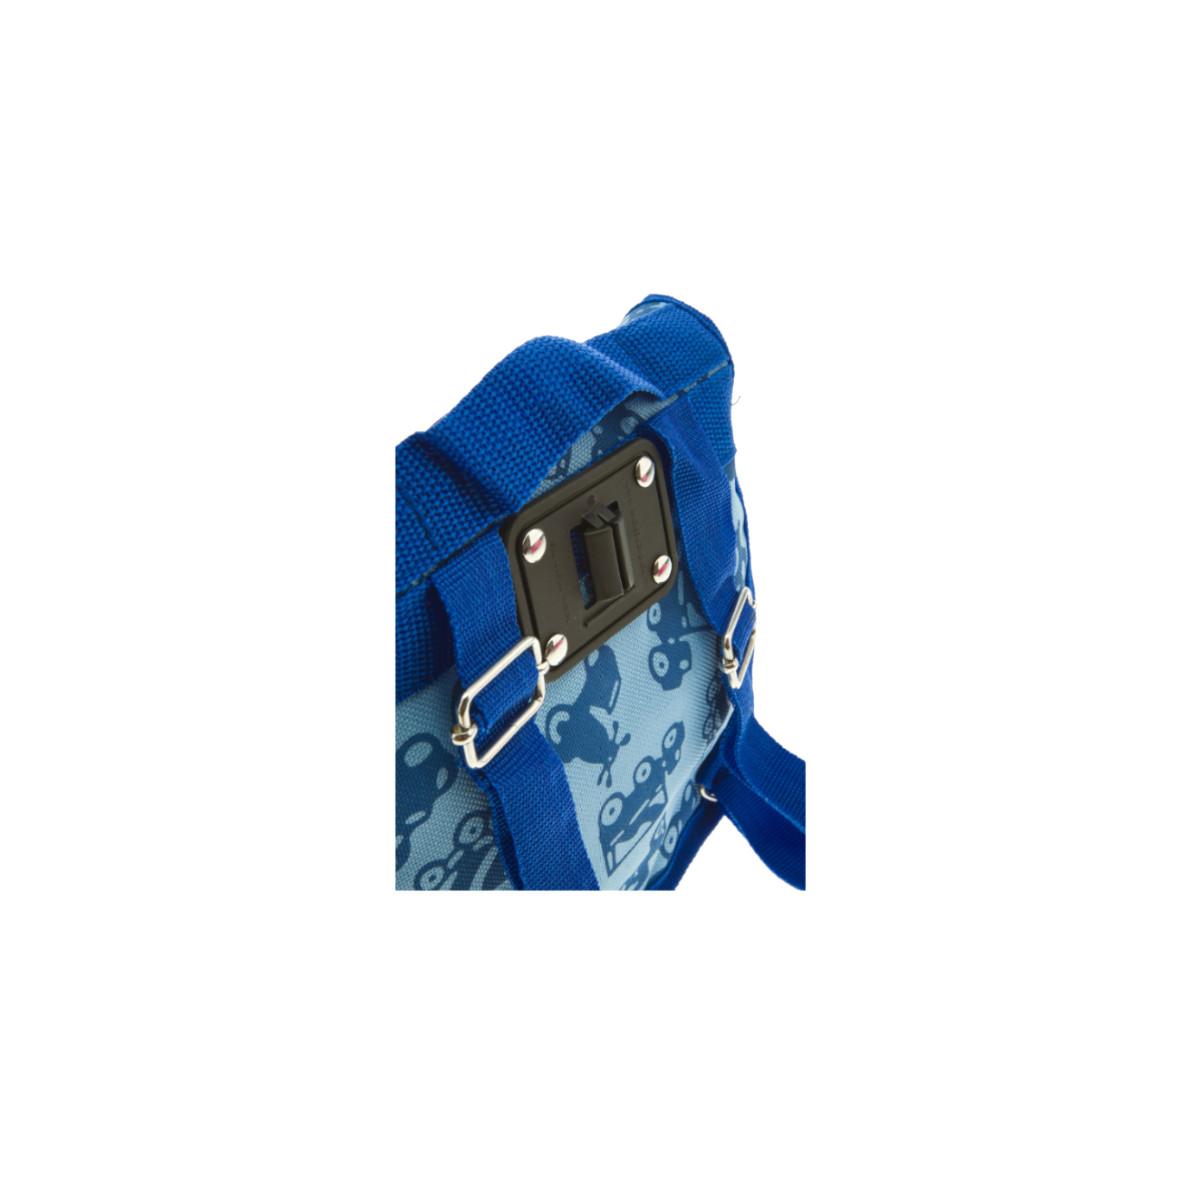 Batoh Micro Blue - 04